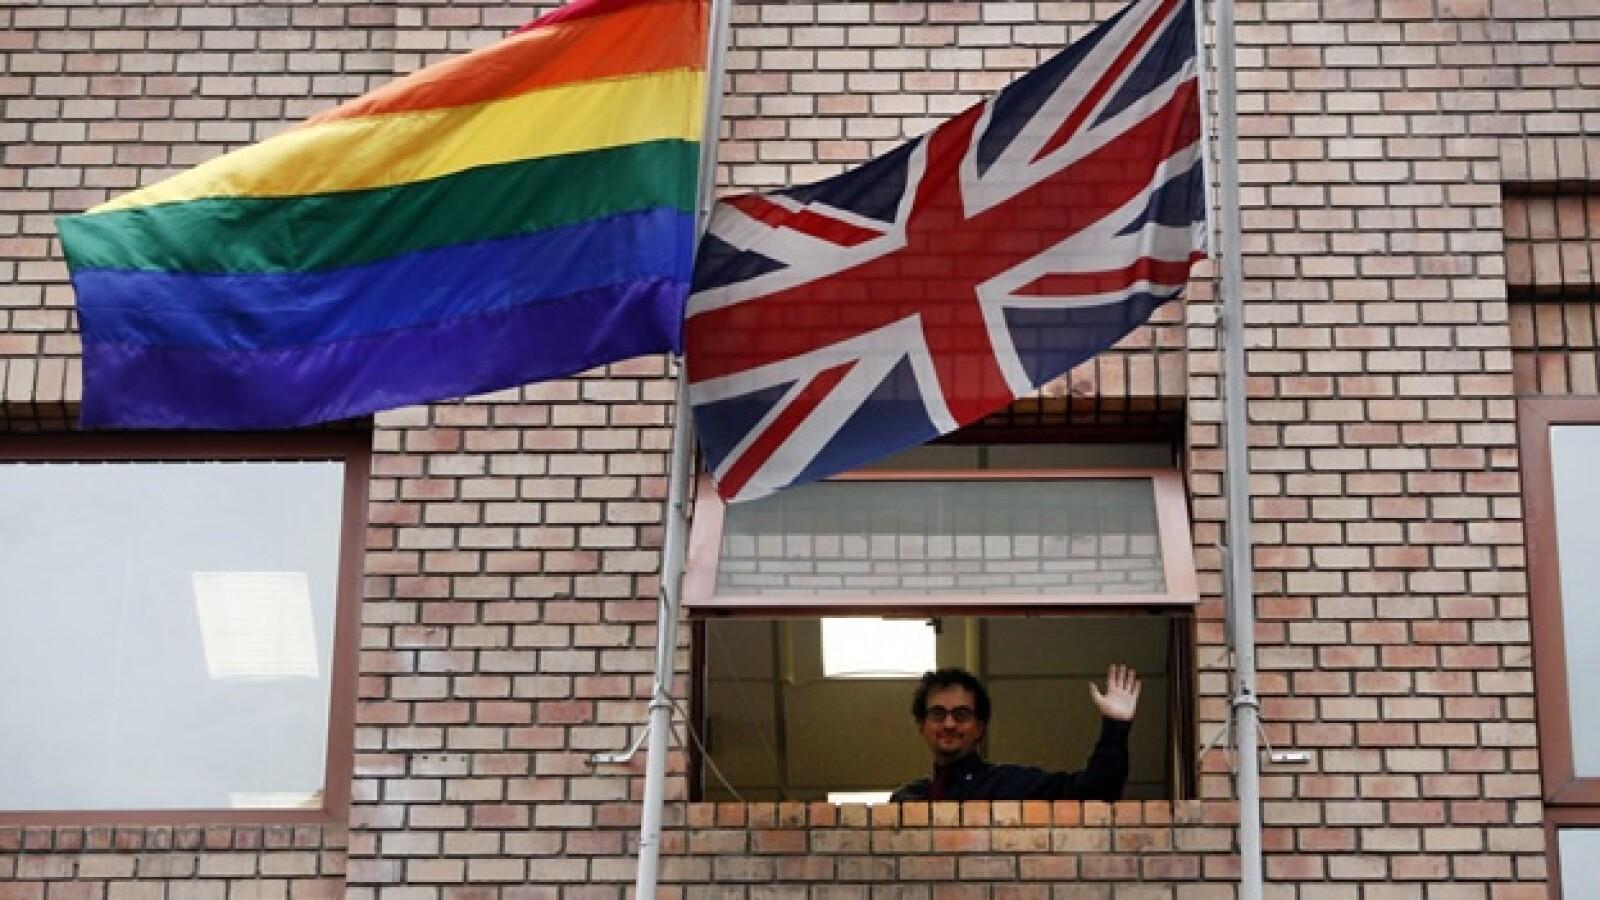 manifestaciones_homofobia